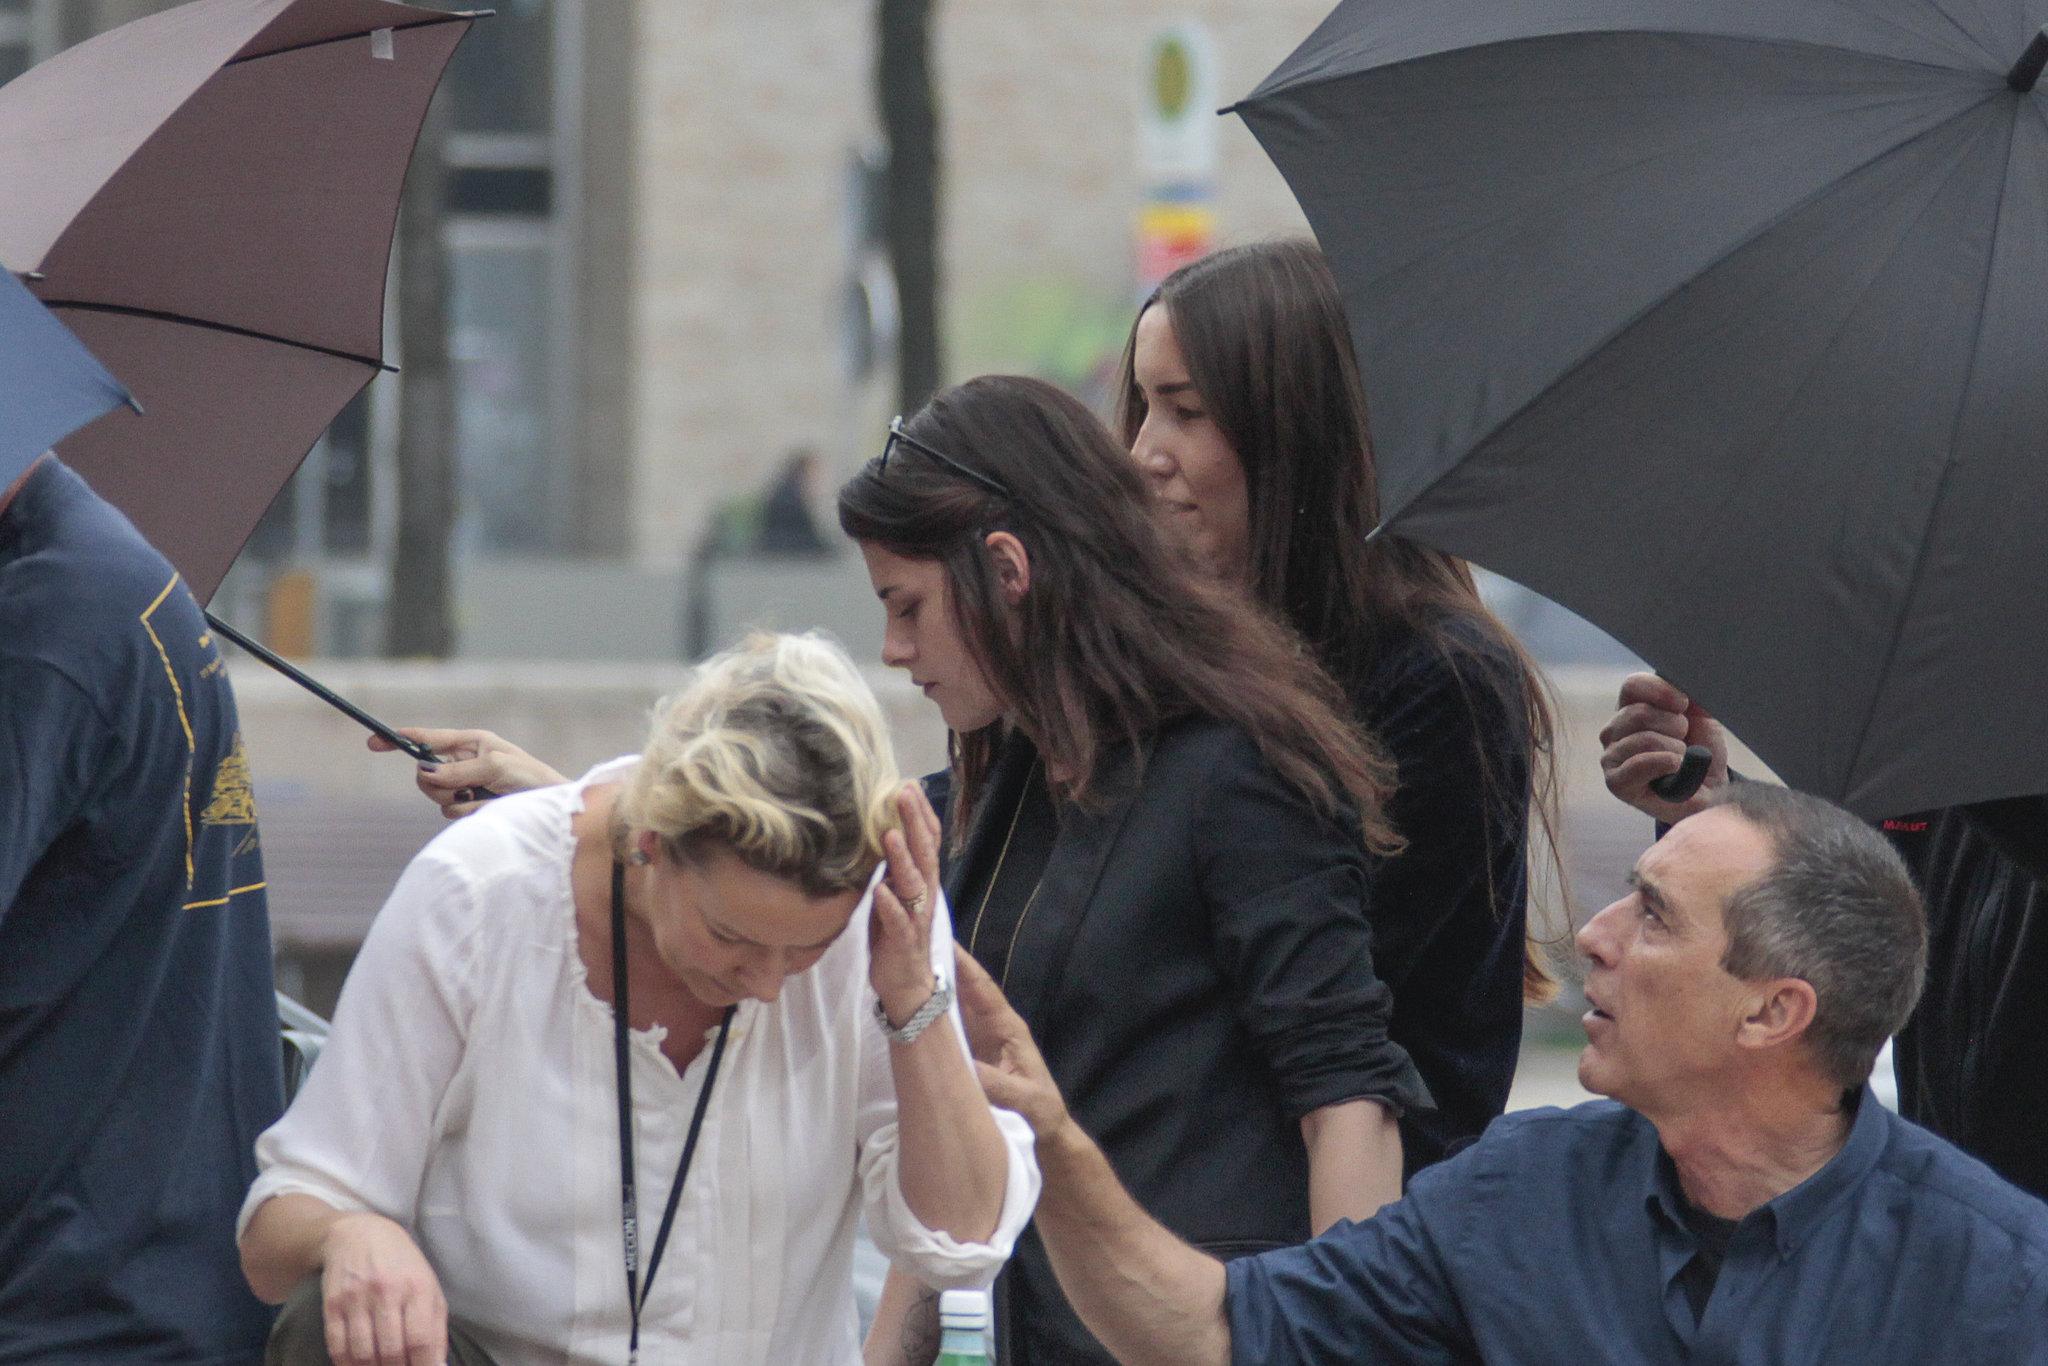 Kristen Stewart Gets Caught Smiling on Set